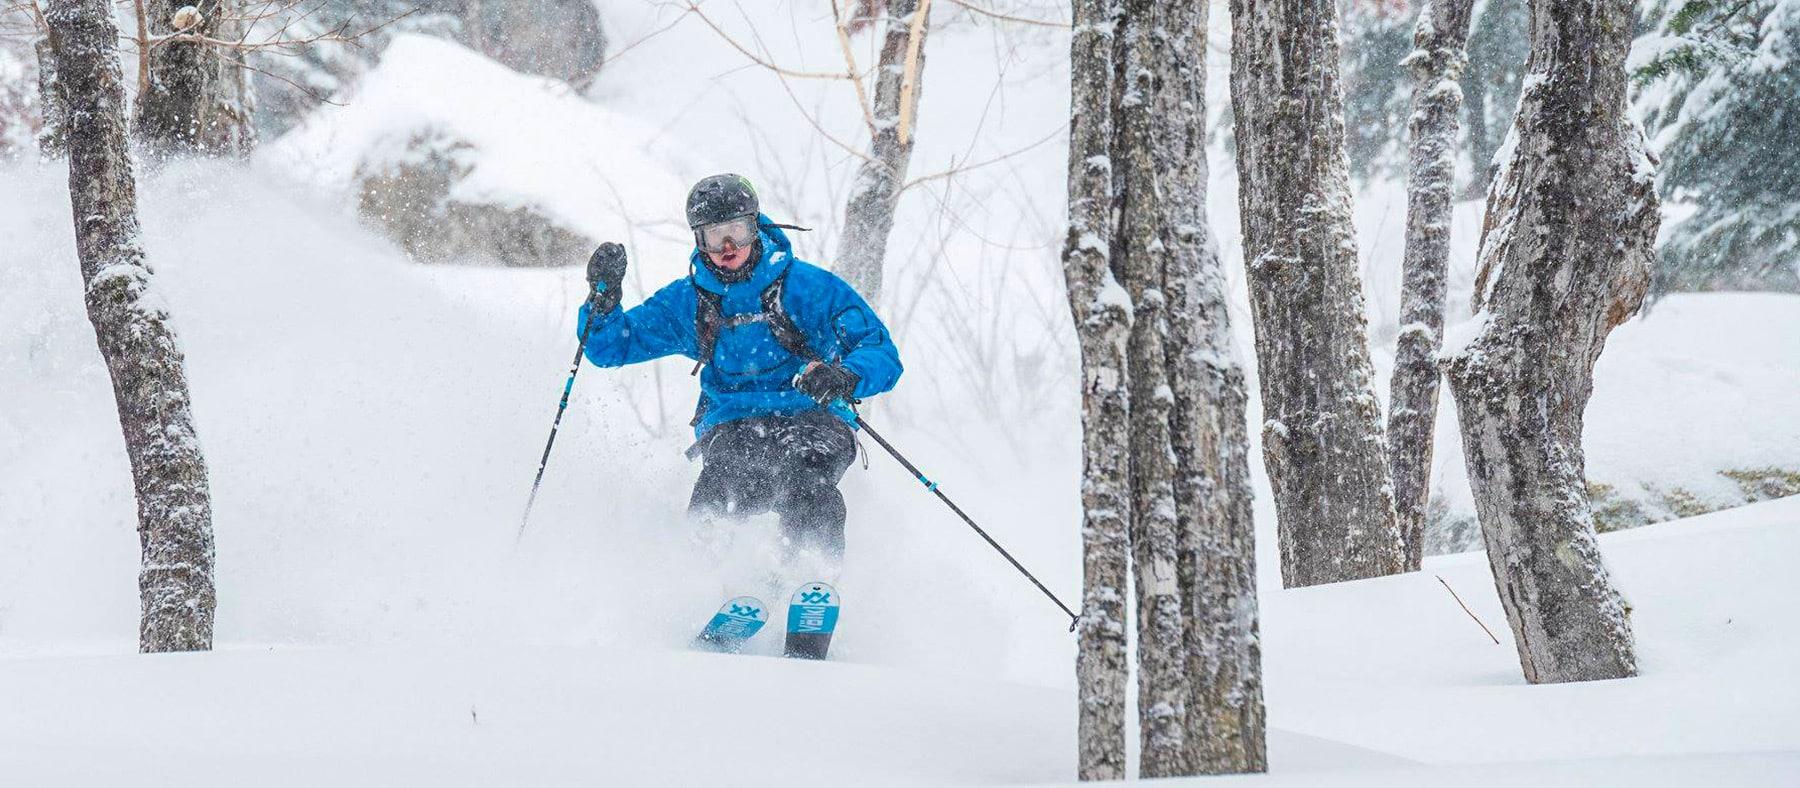 ski-hors-piste-charlevoix-hiver-skier-quebec-le-mag